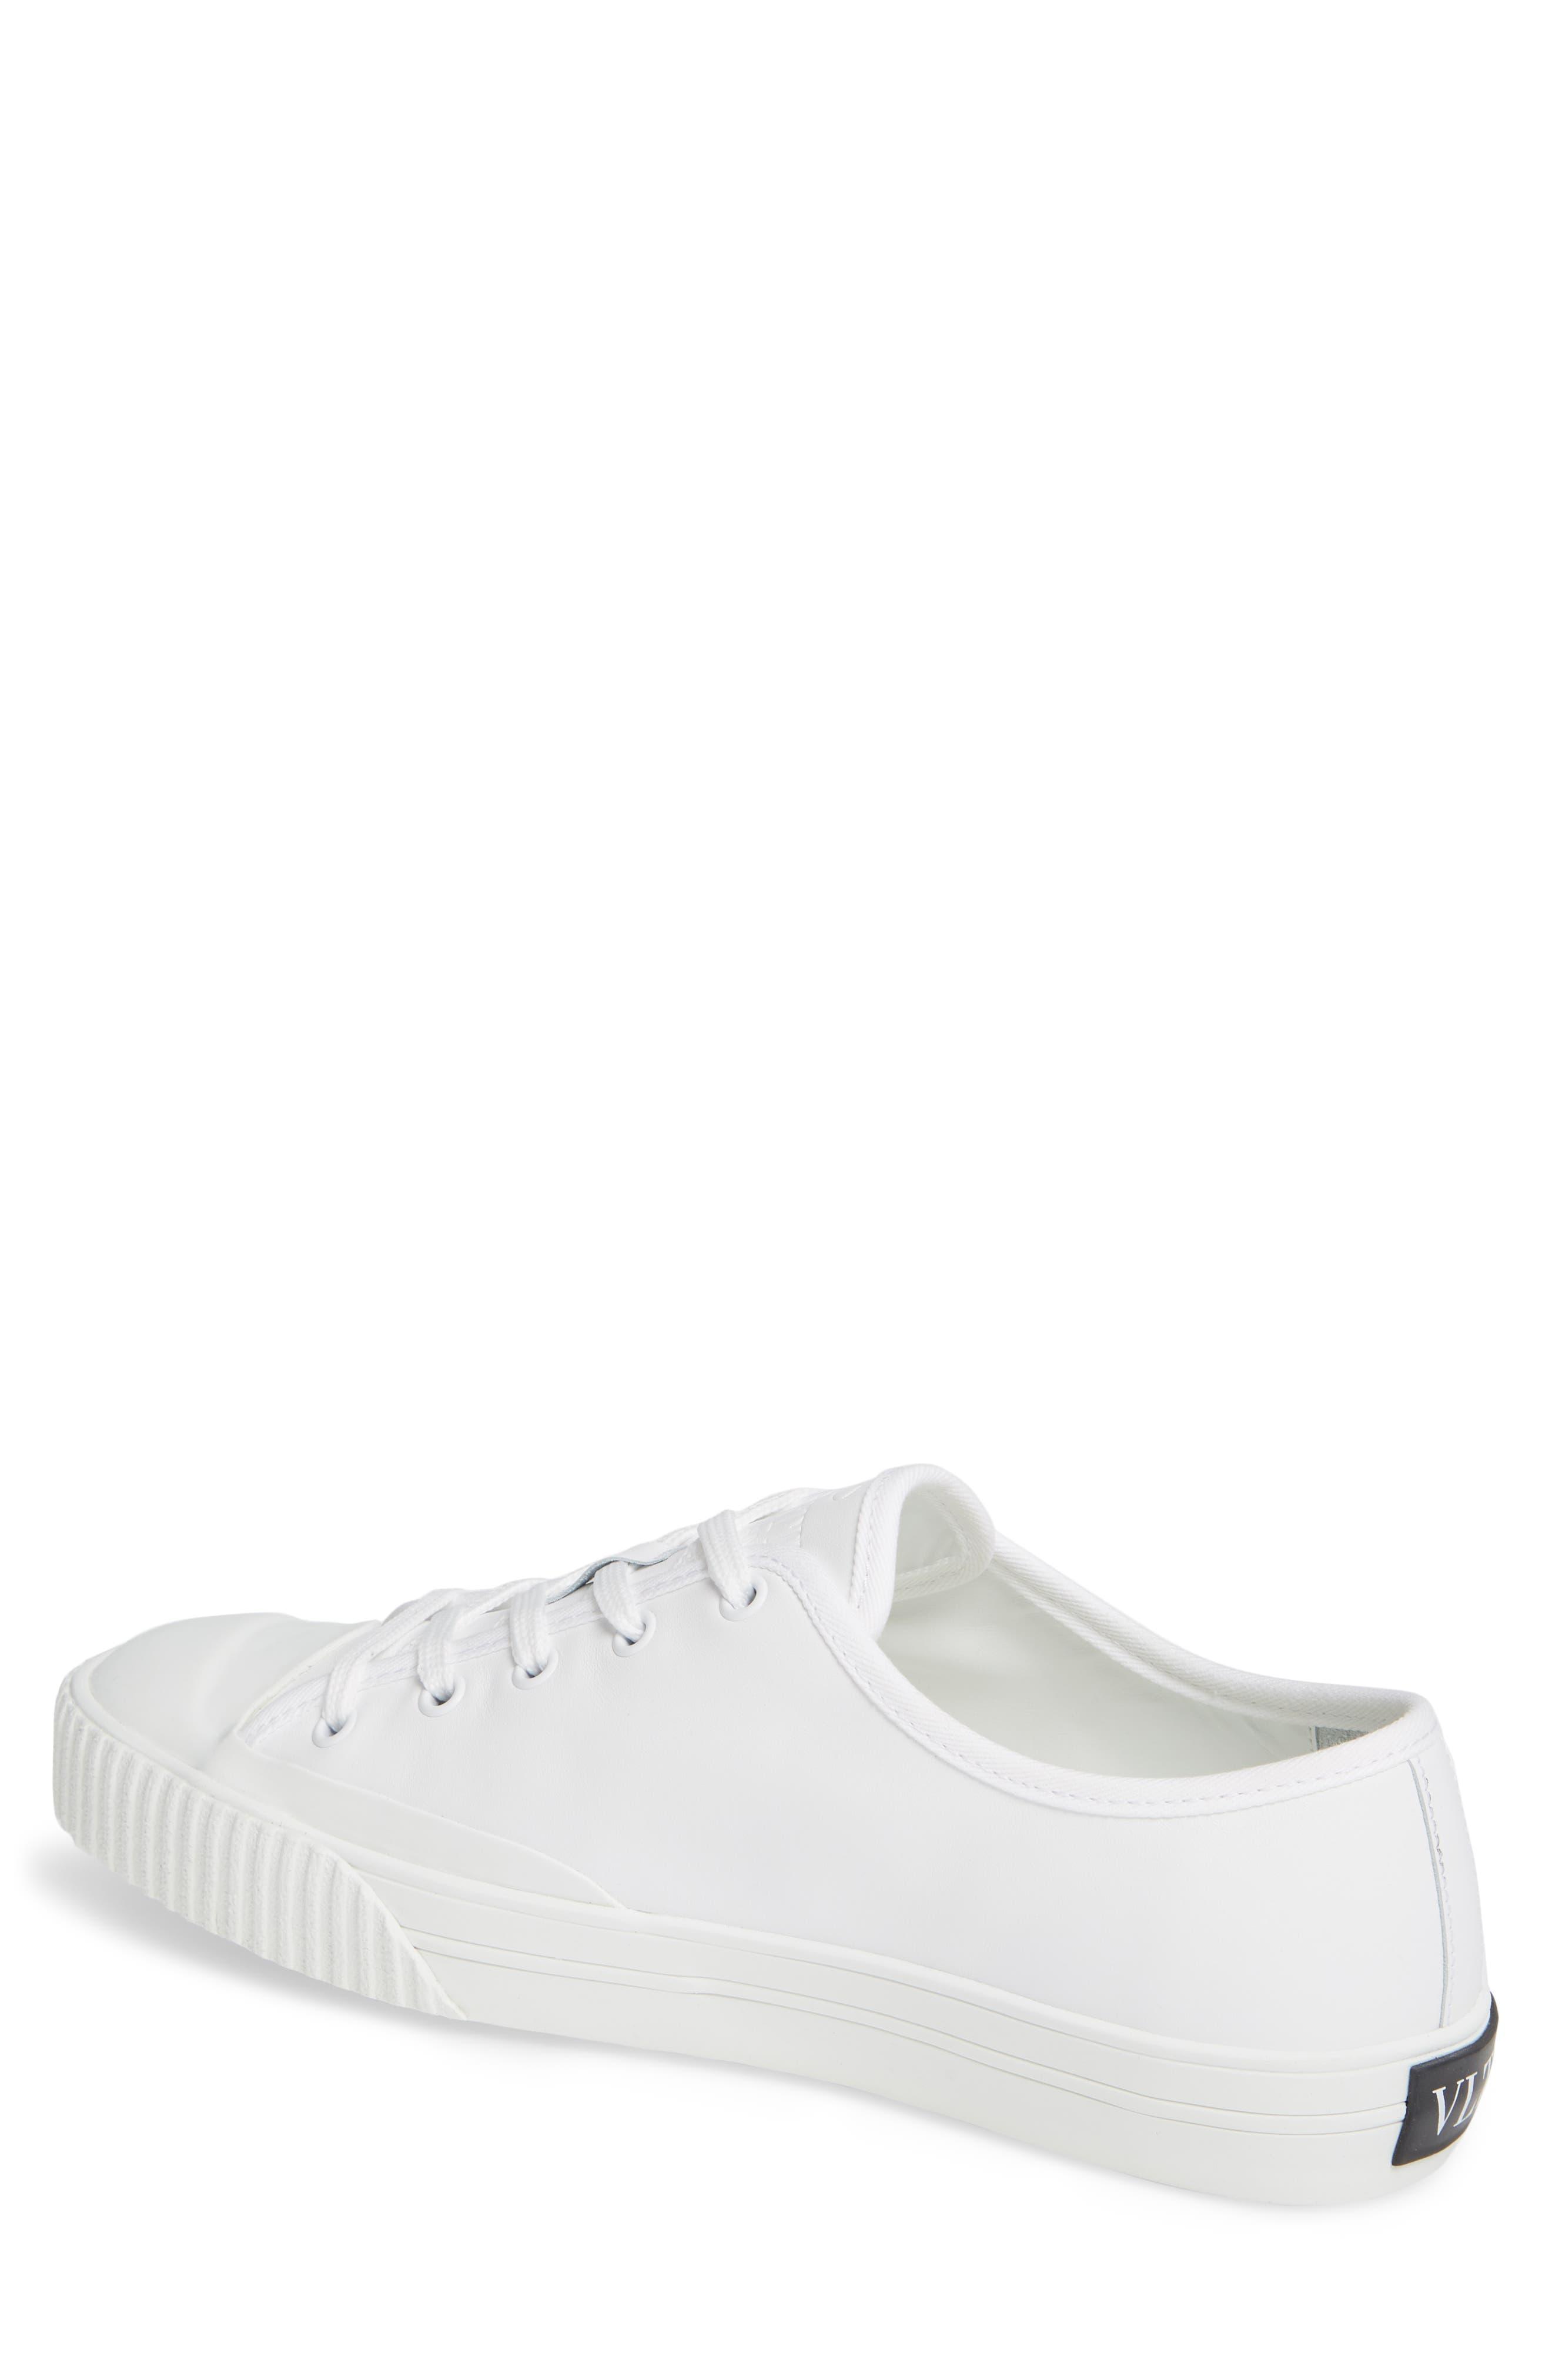 VLTN Low Top Sneaker,                             Alternate thumbnail 2, color,                             102